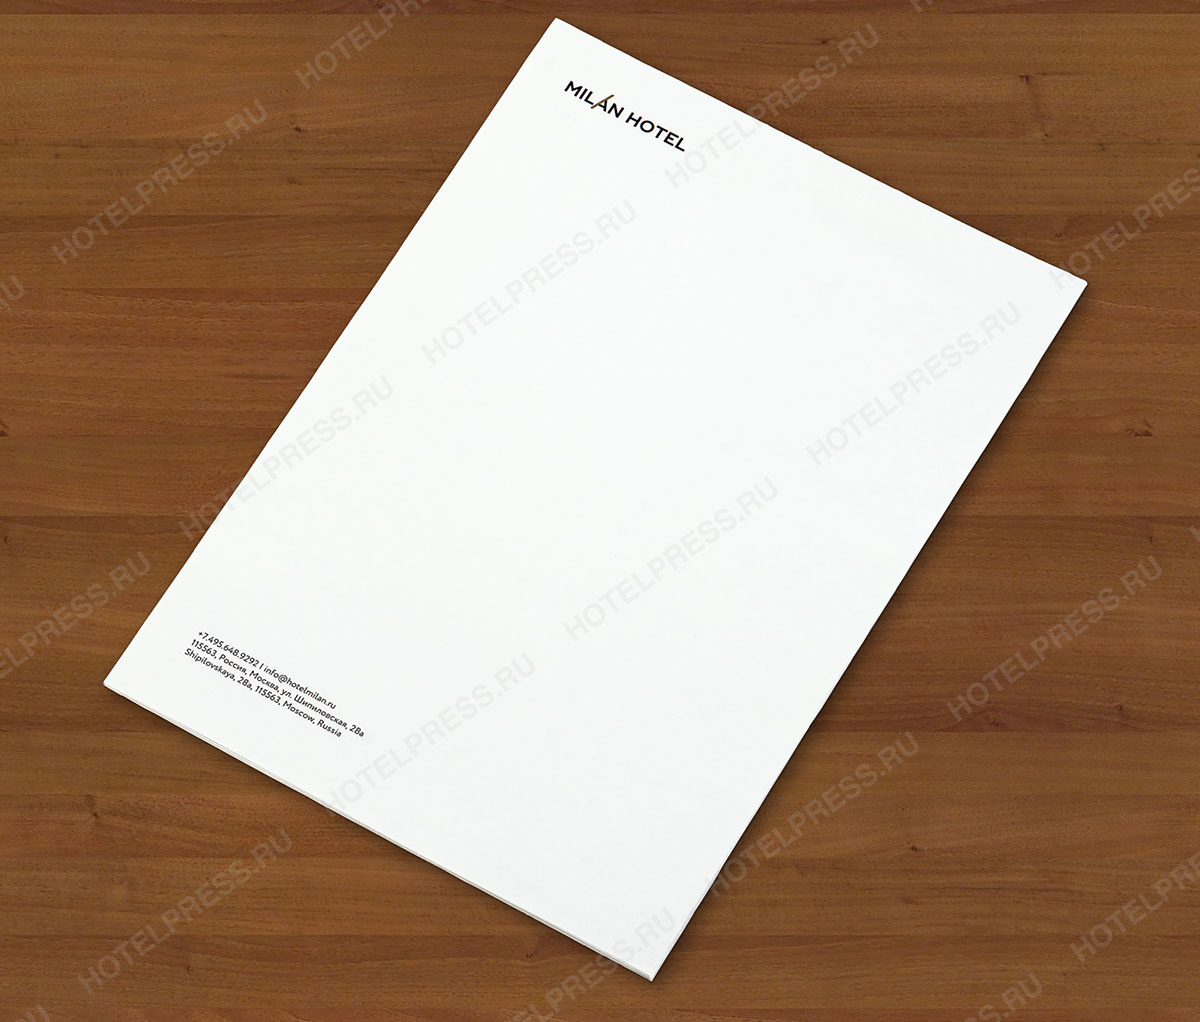 Блокнот A5 (148 х 210 мм) 50 листов с логотипом